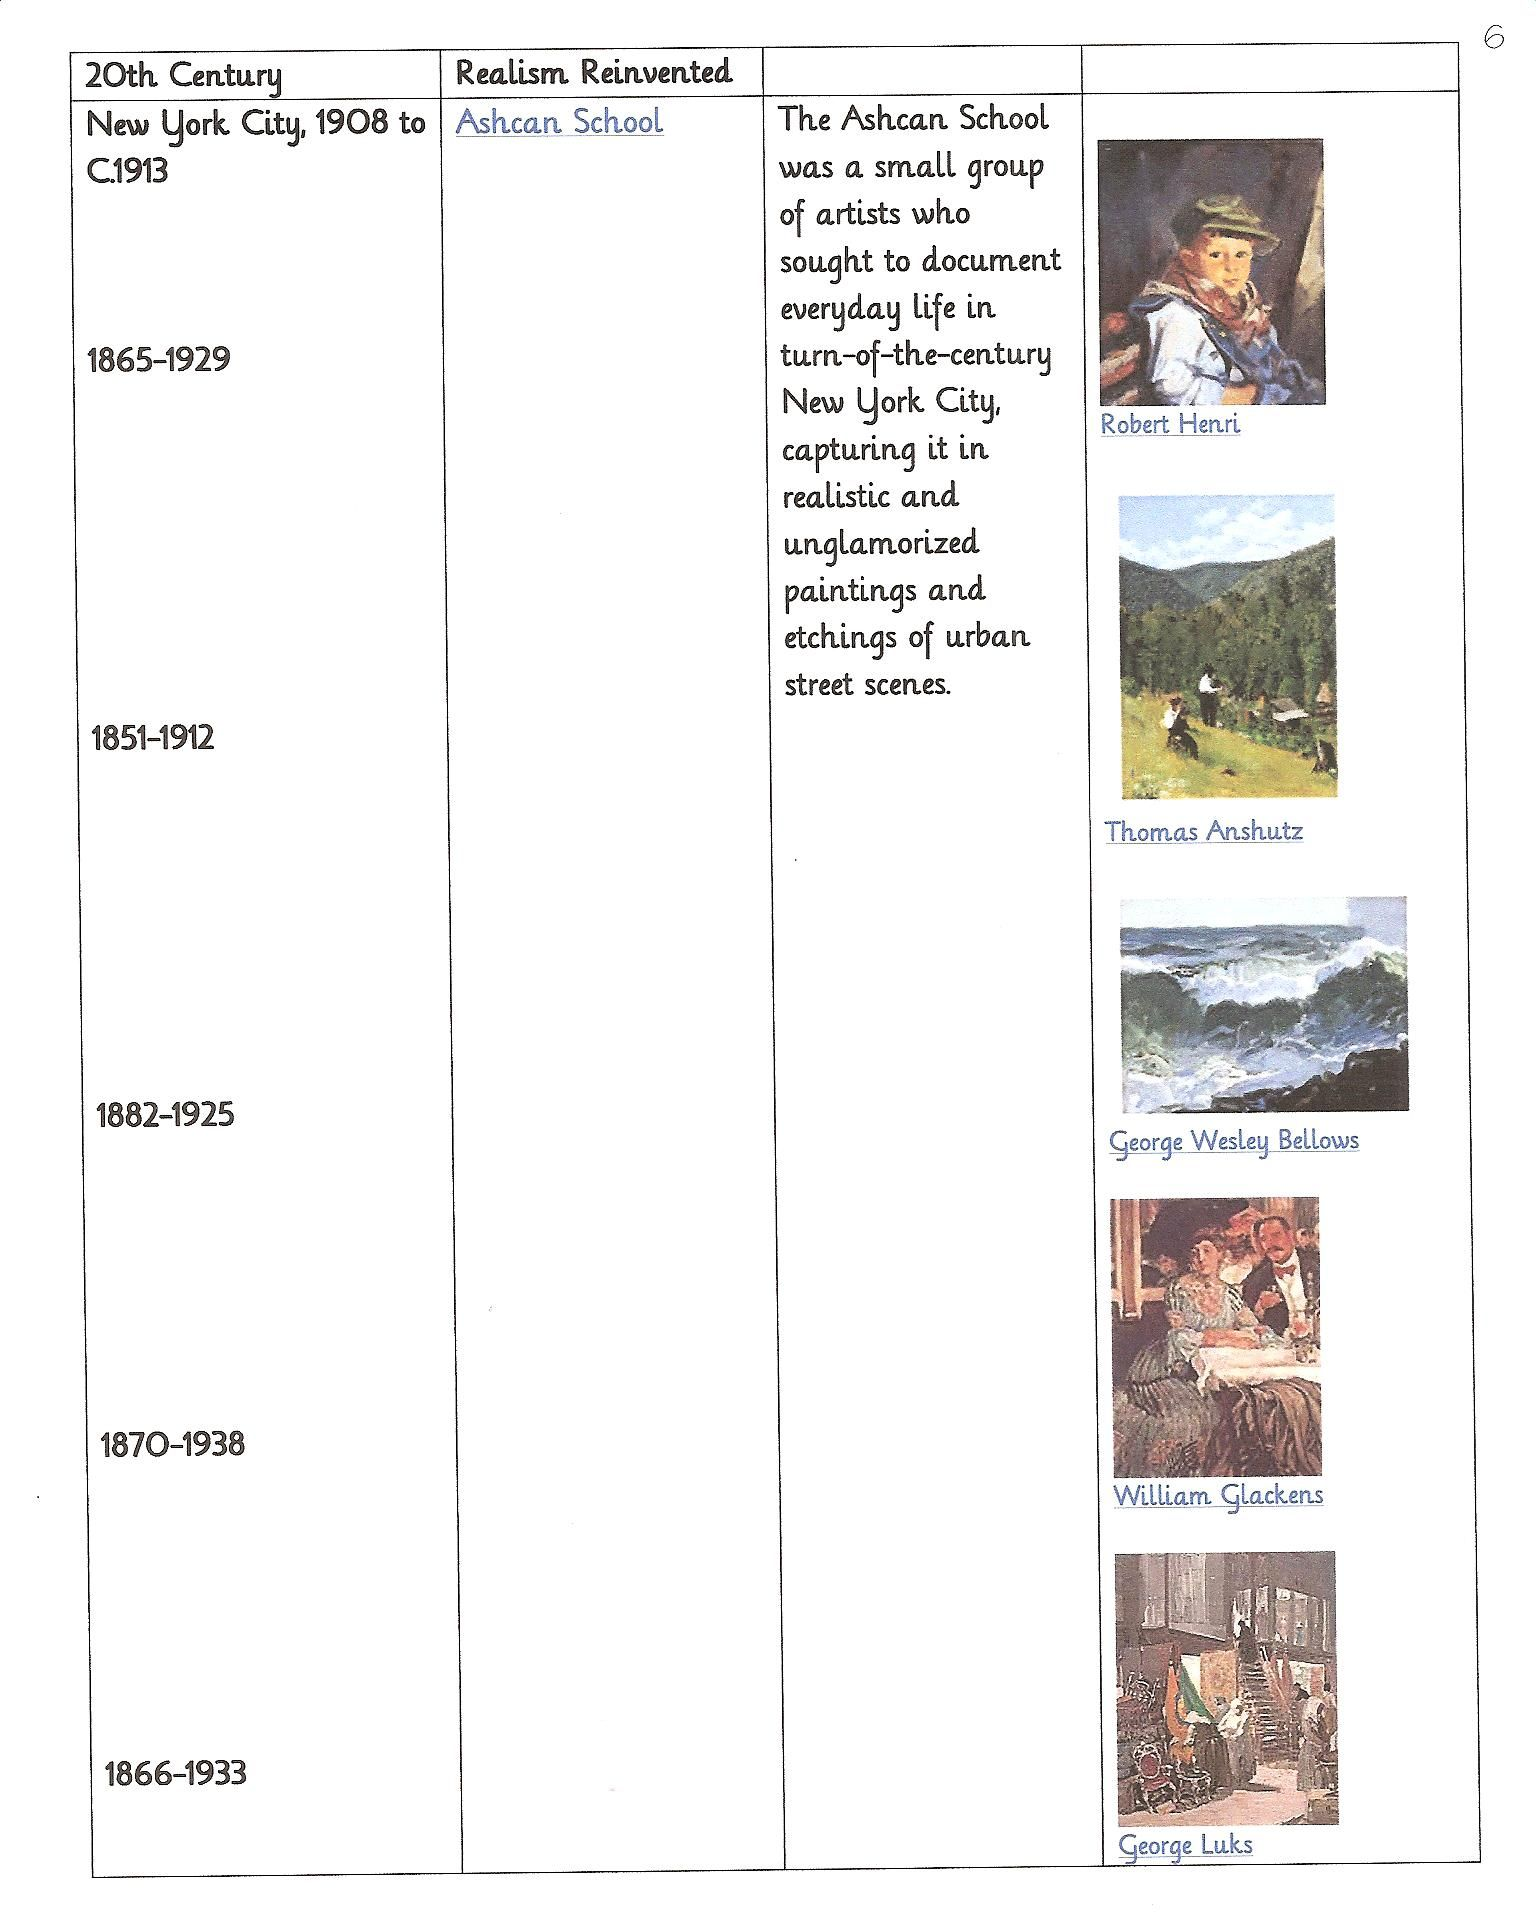 Characteristics of the early 20th century era